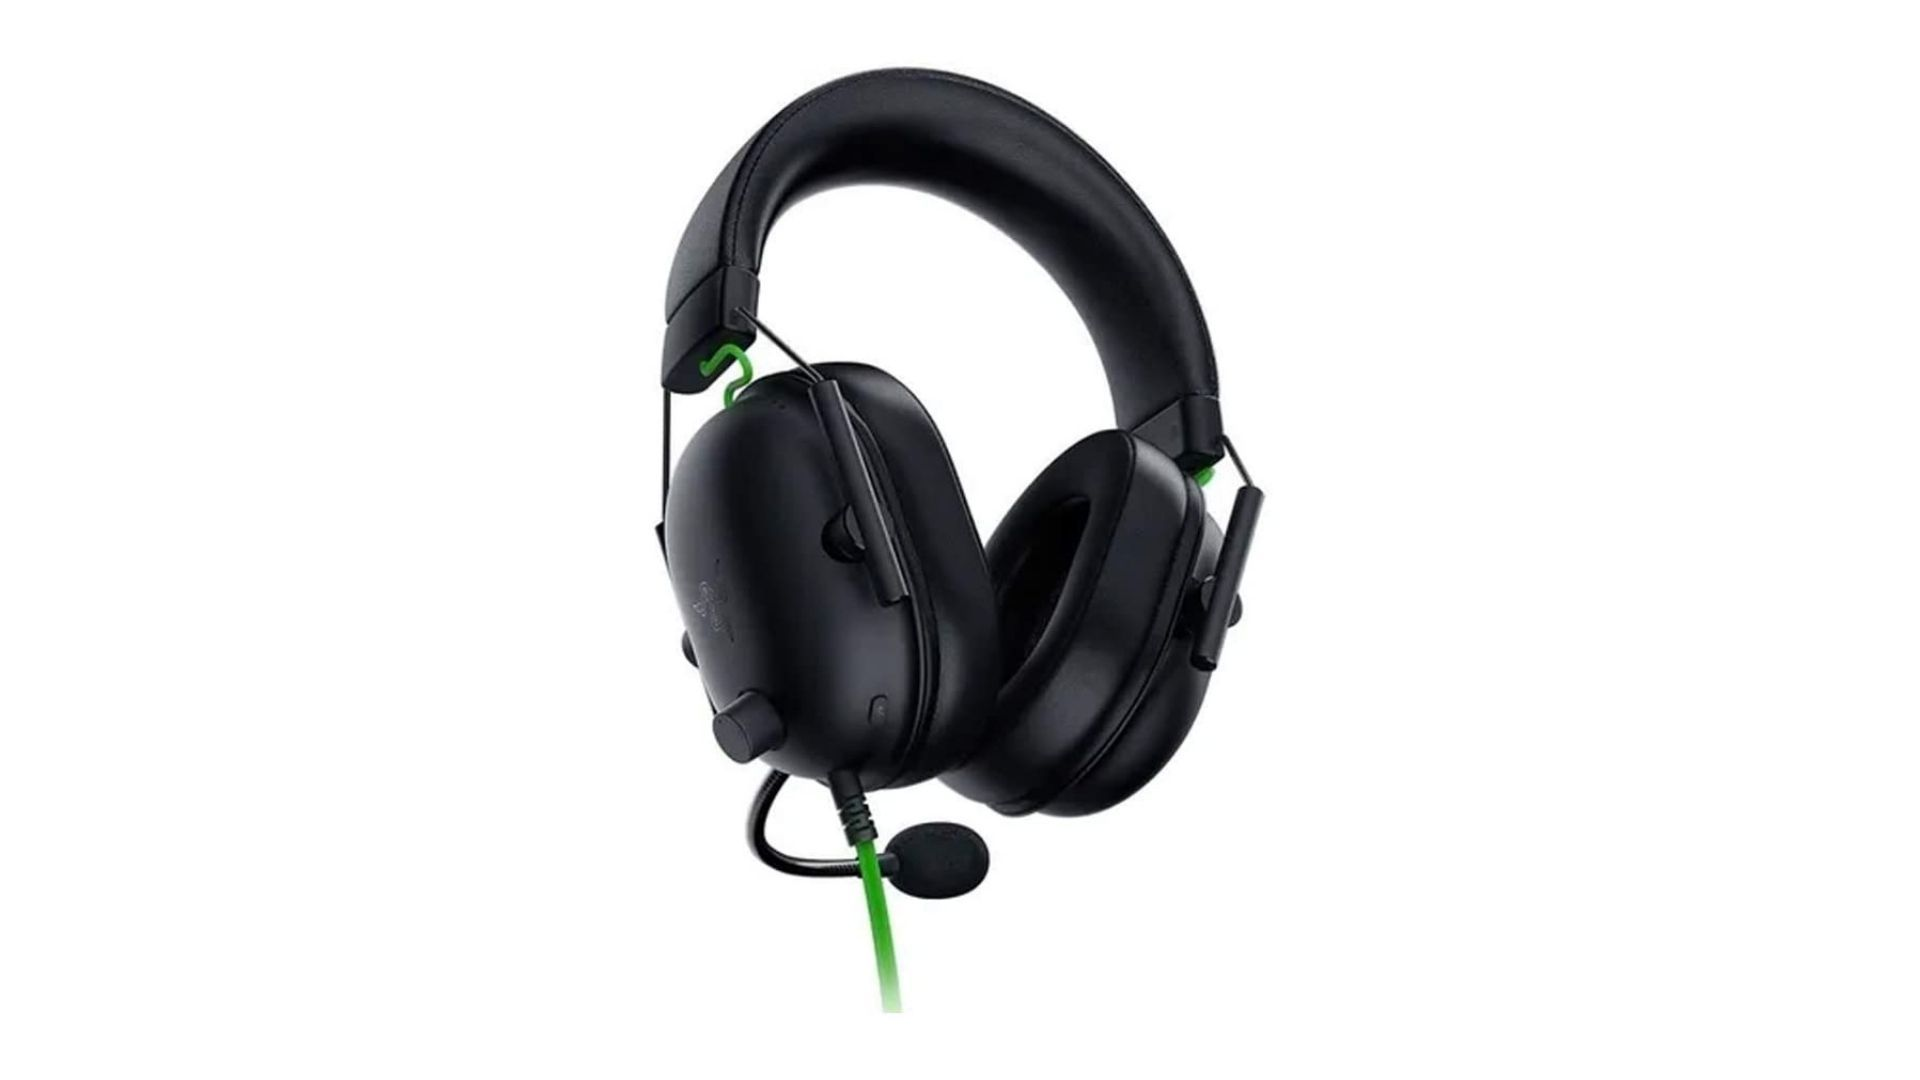 Headset Razer BlackShark V2 preto